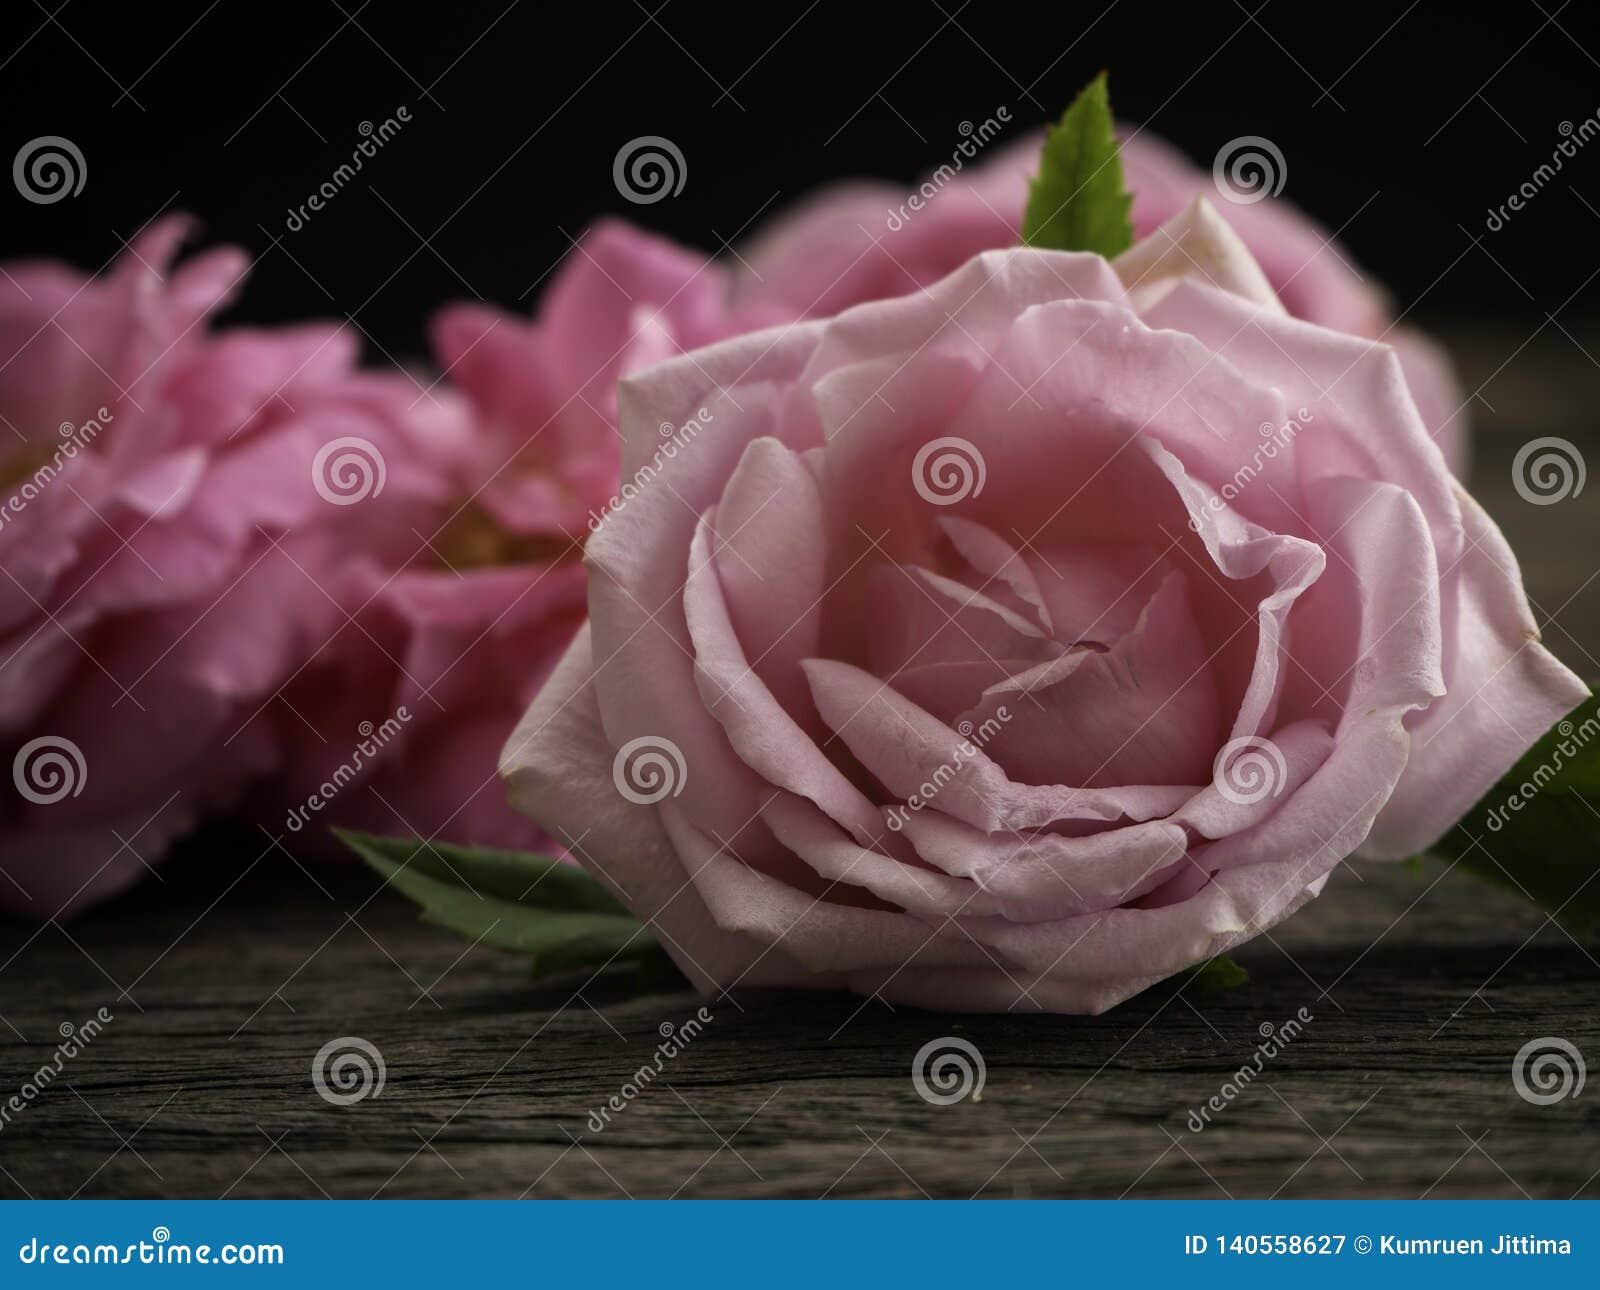 Rosa Rosen auf dem alten Bretterboden